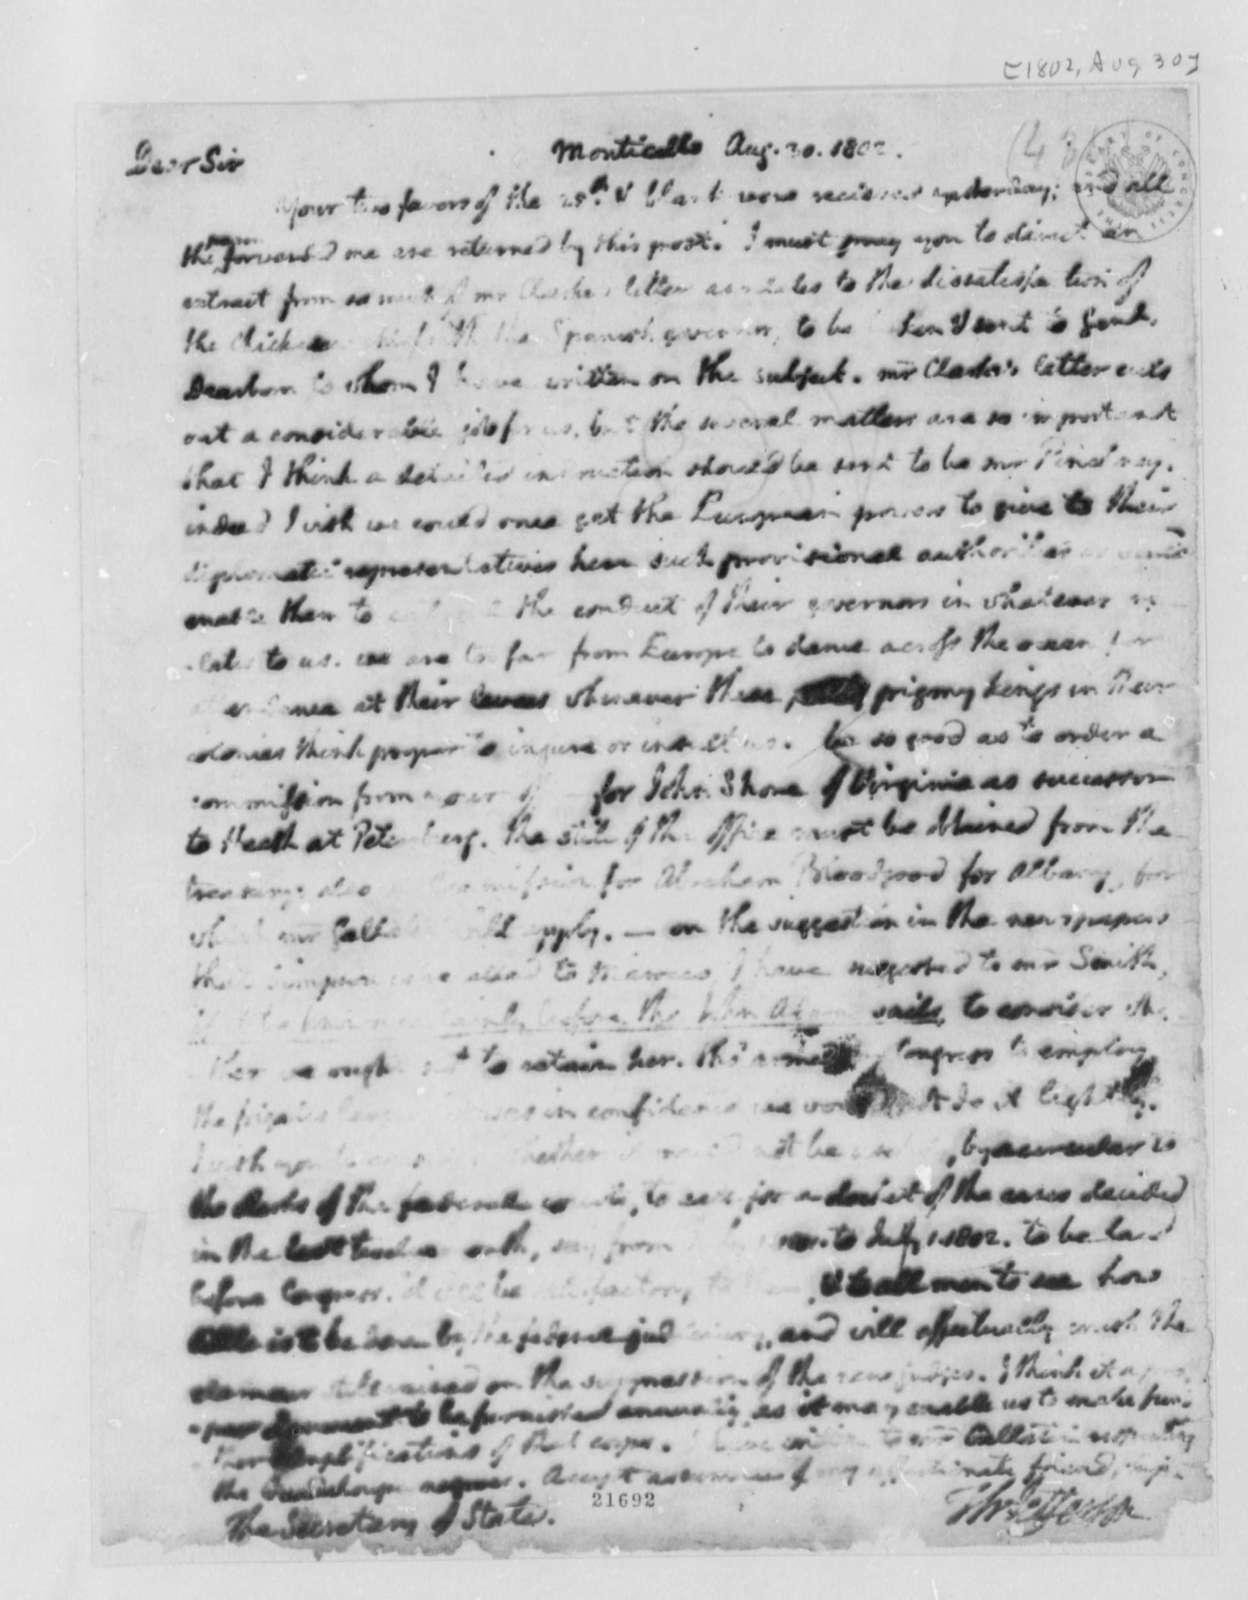 Thomas Jefferson to James Madison, August 30, 1802